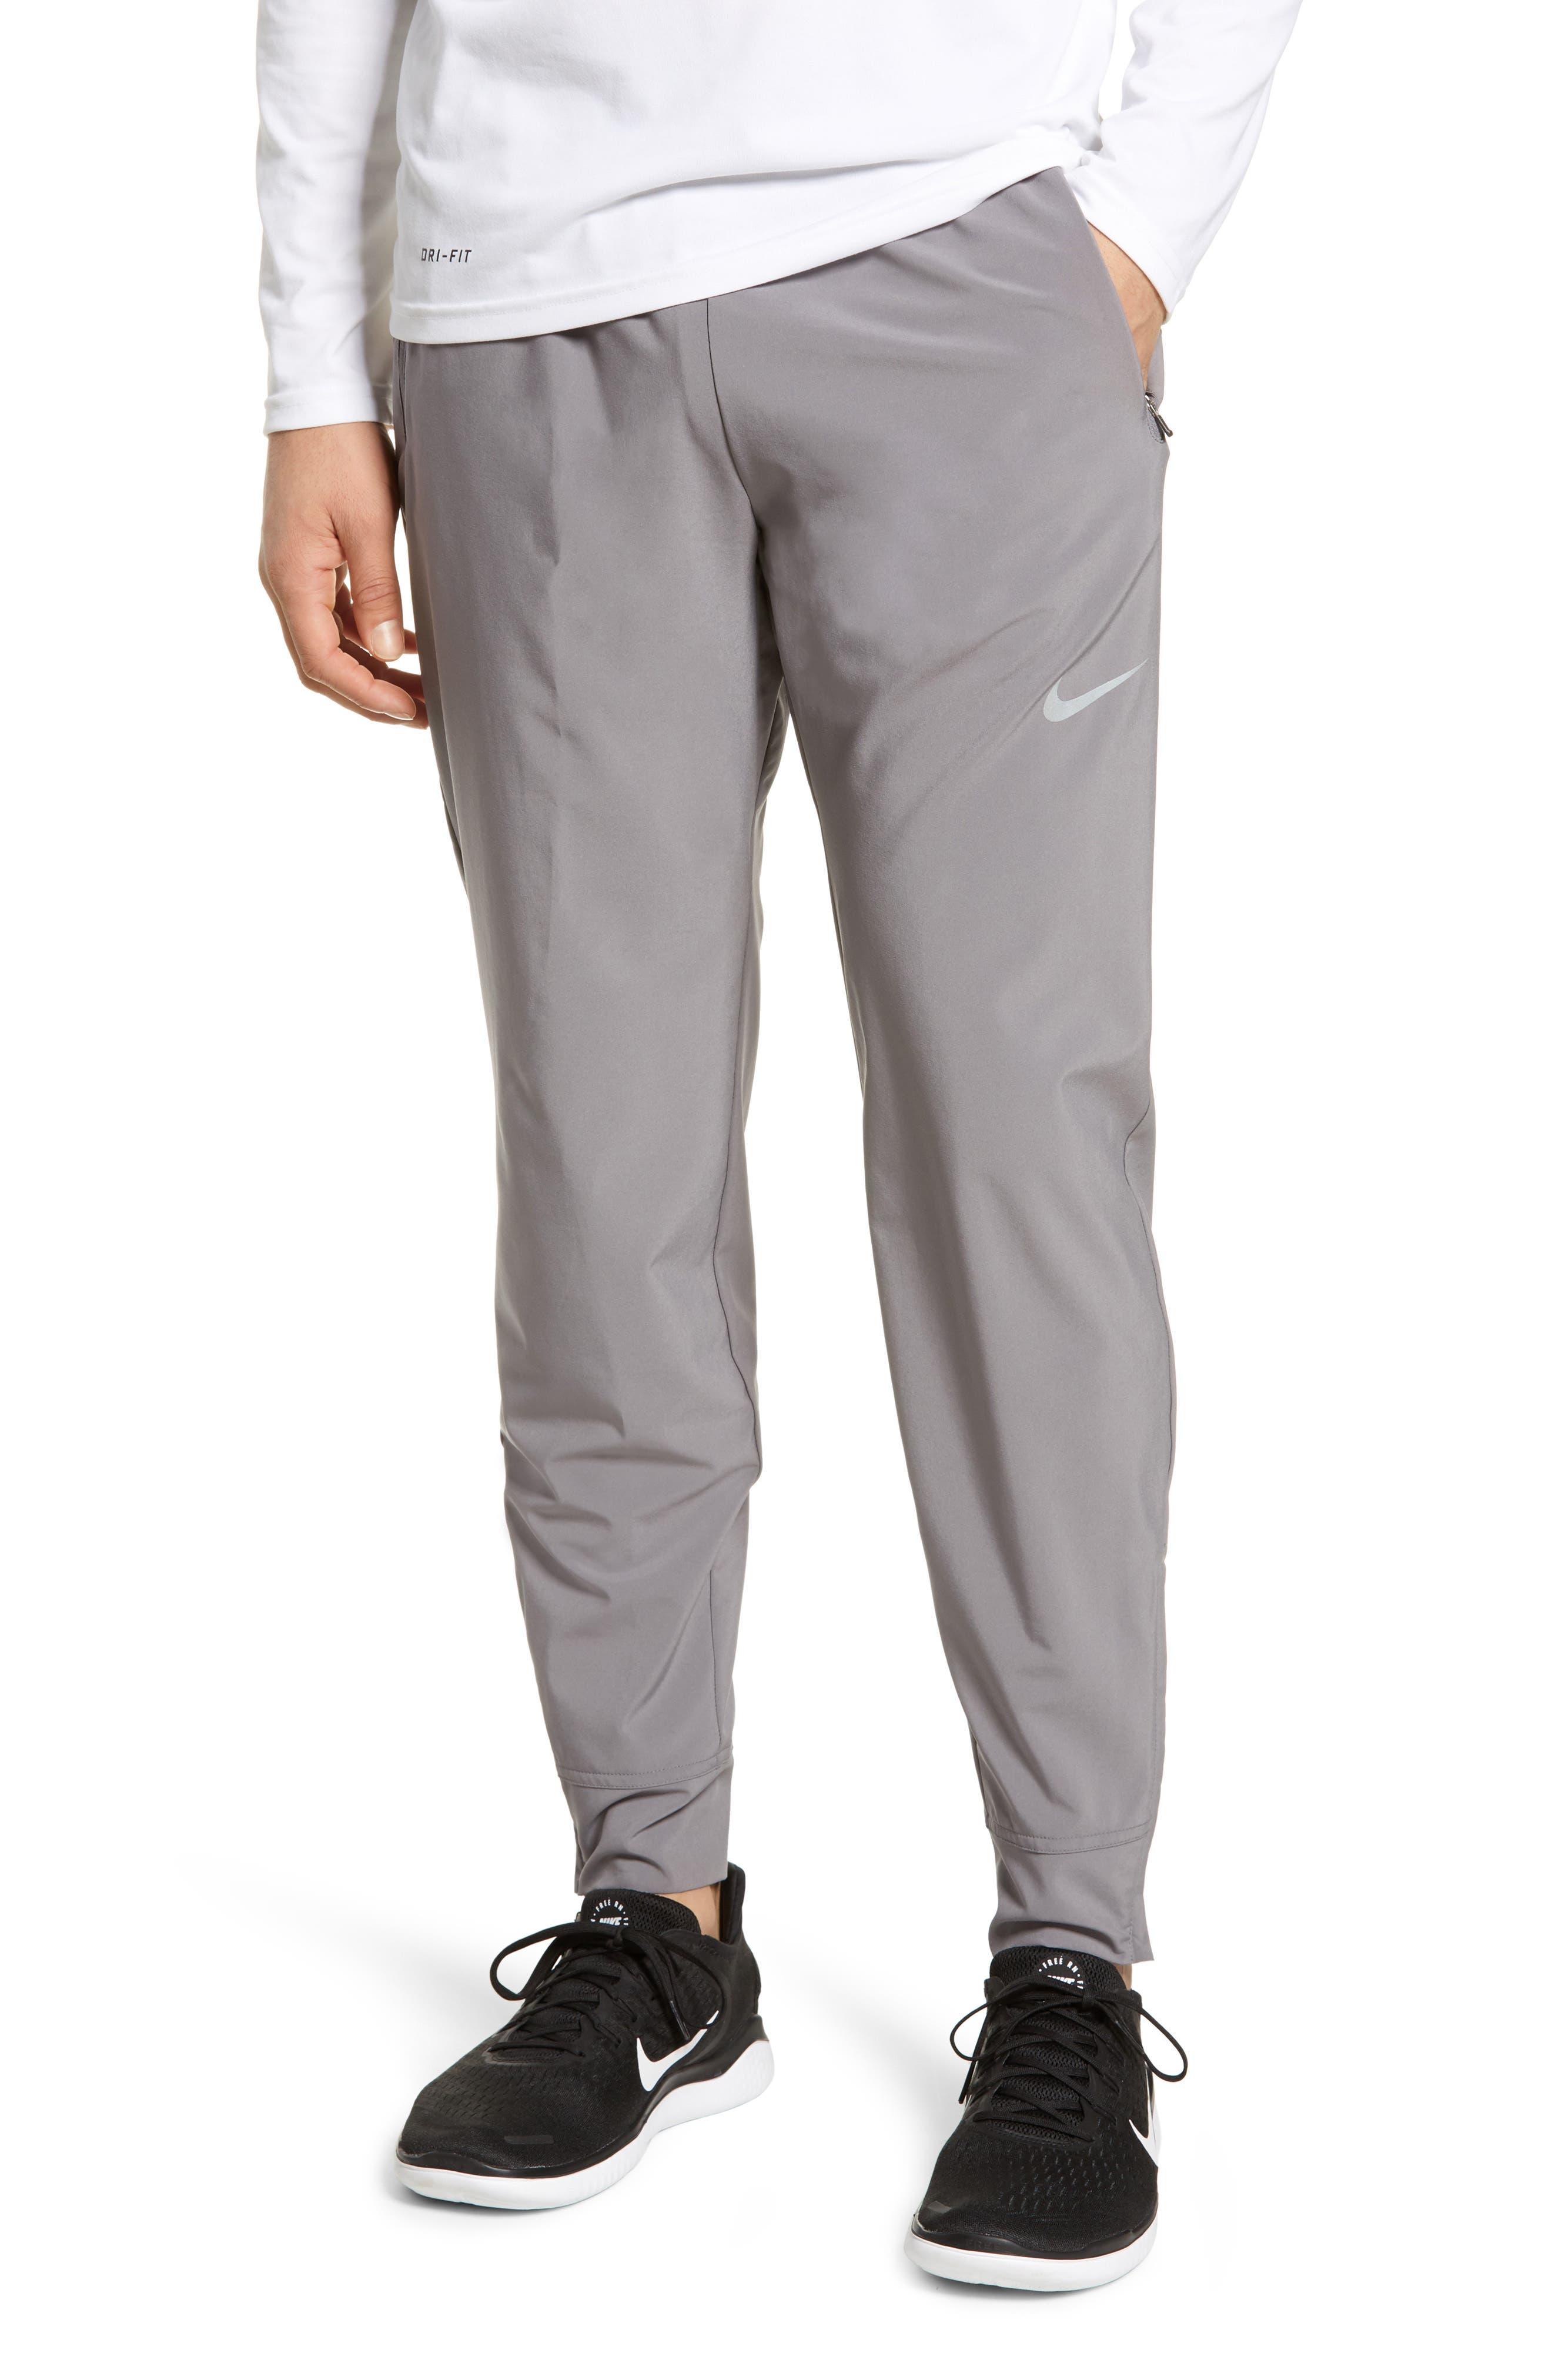 e0ba258c62f Men's Nike Clothing | Nordstrom